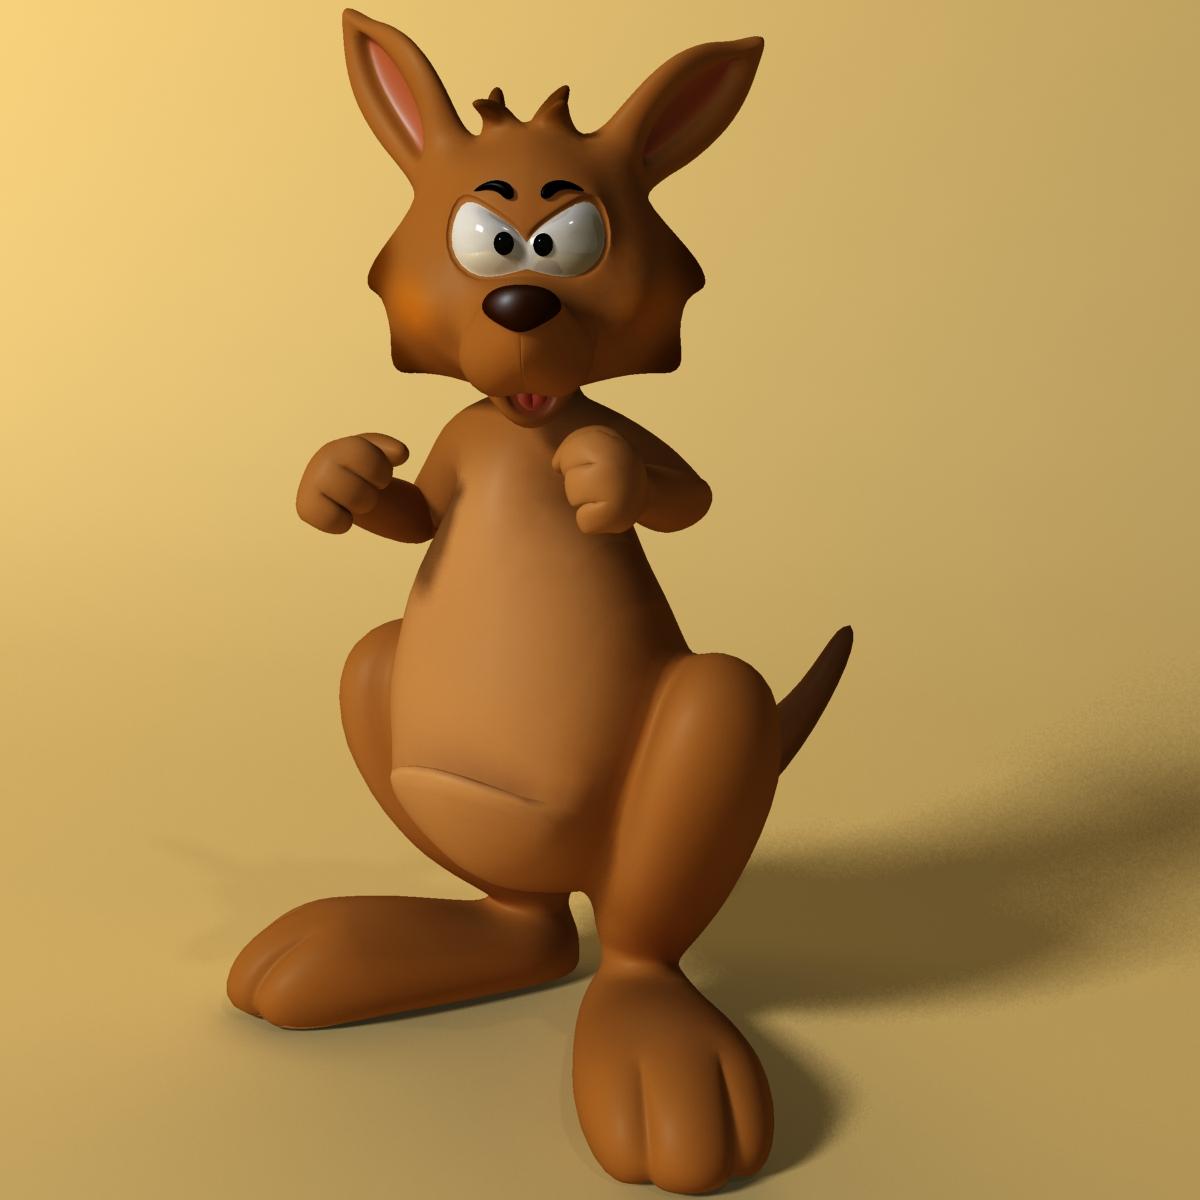 cartoon kangaroo rigged and animated 3d model max fbx  obj 220167